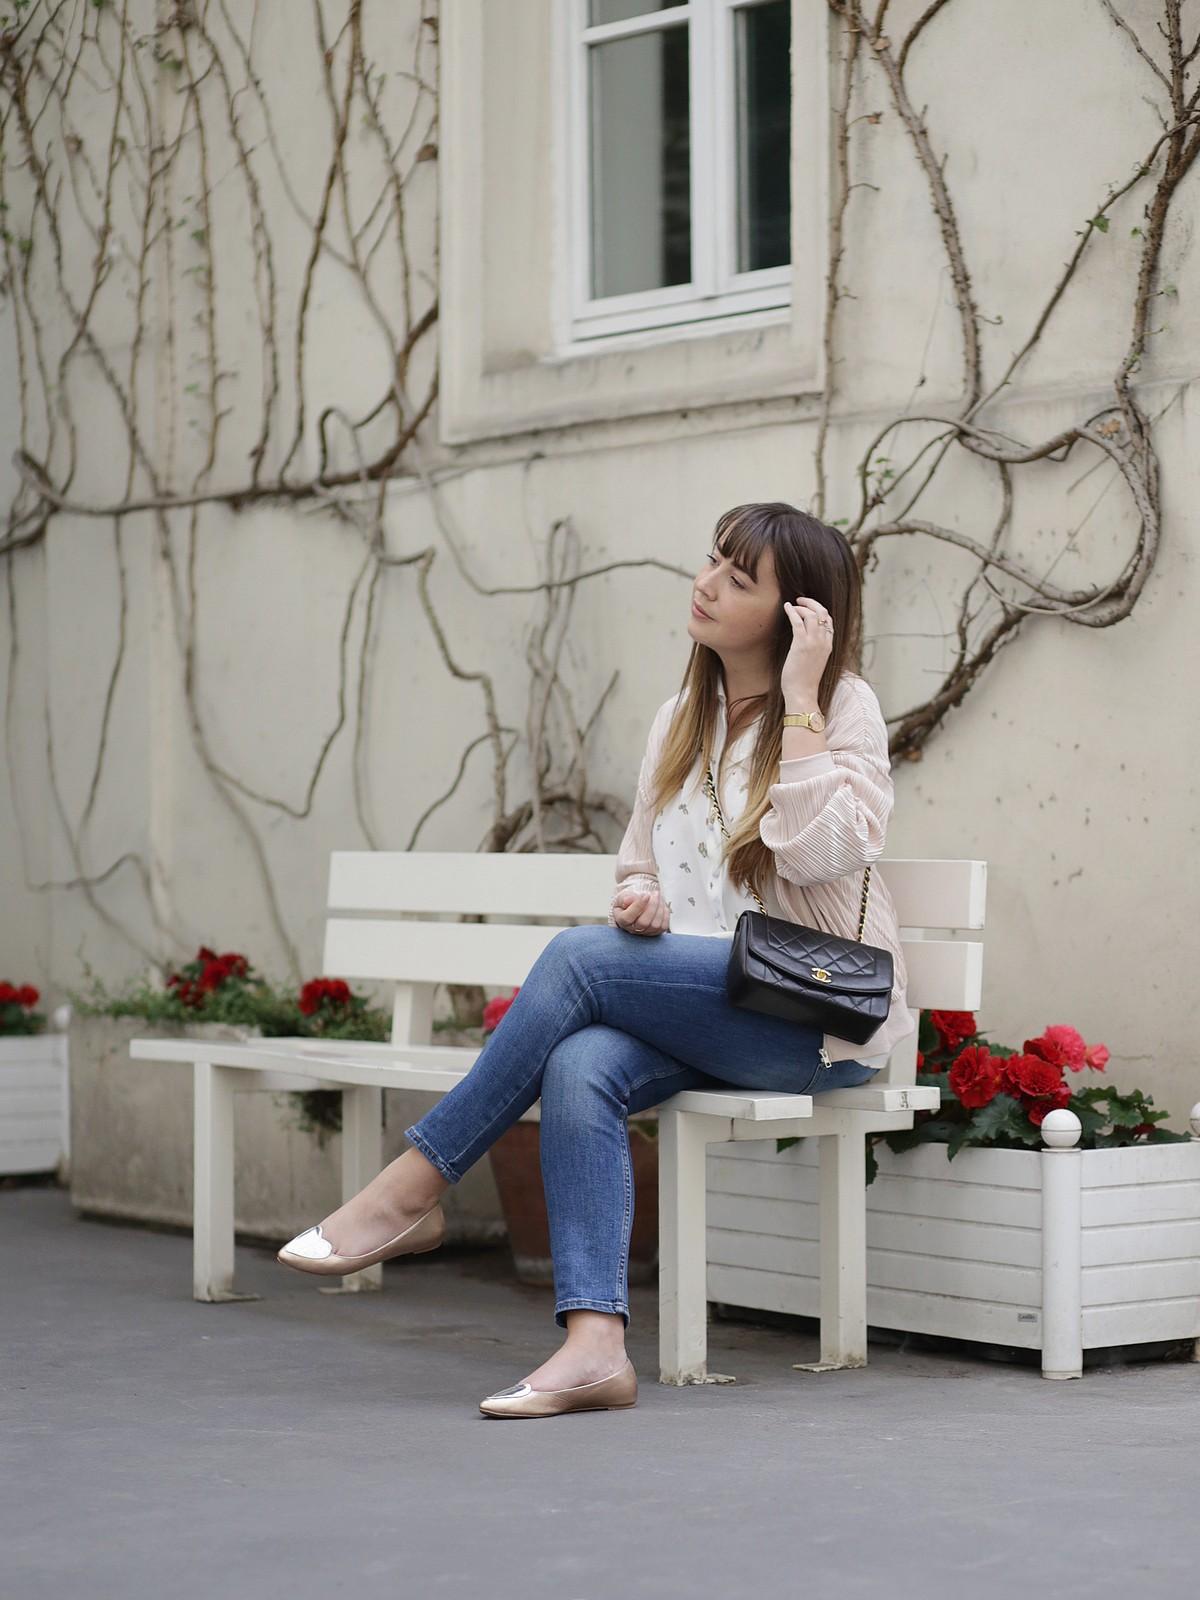 rare clothing - avocado - du style madame - look - mode - blog